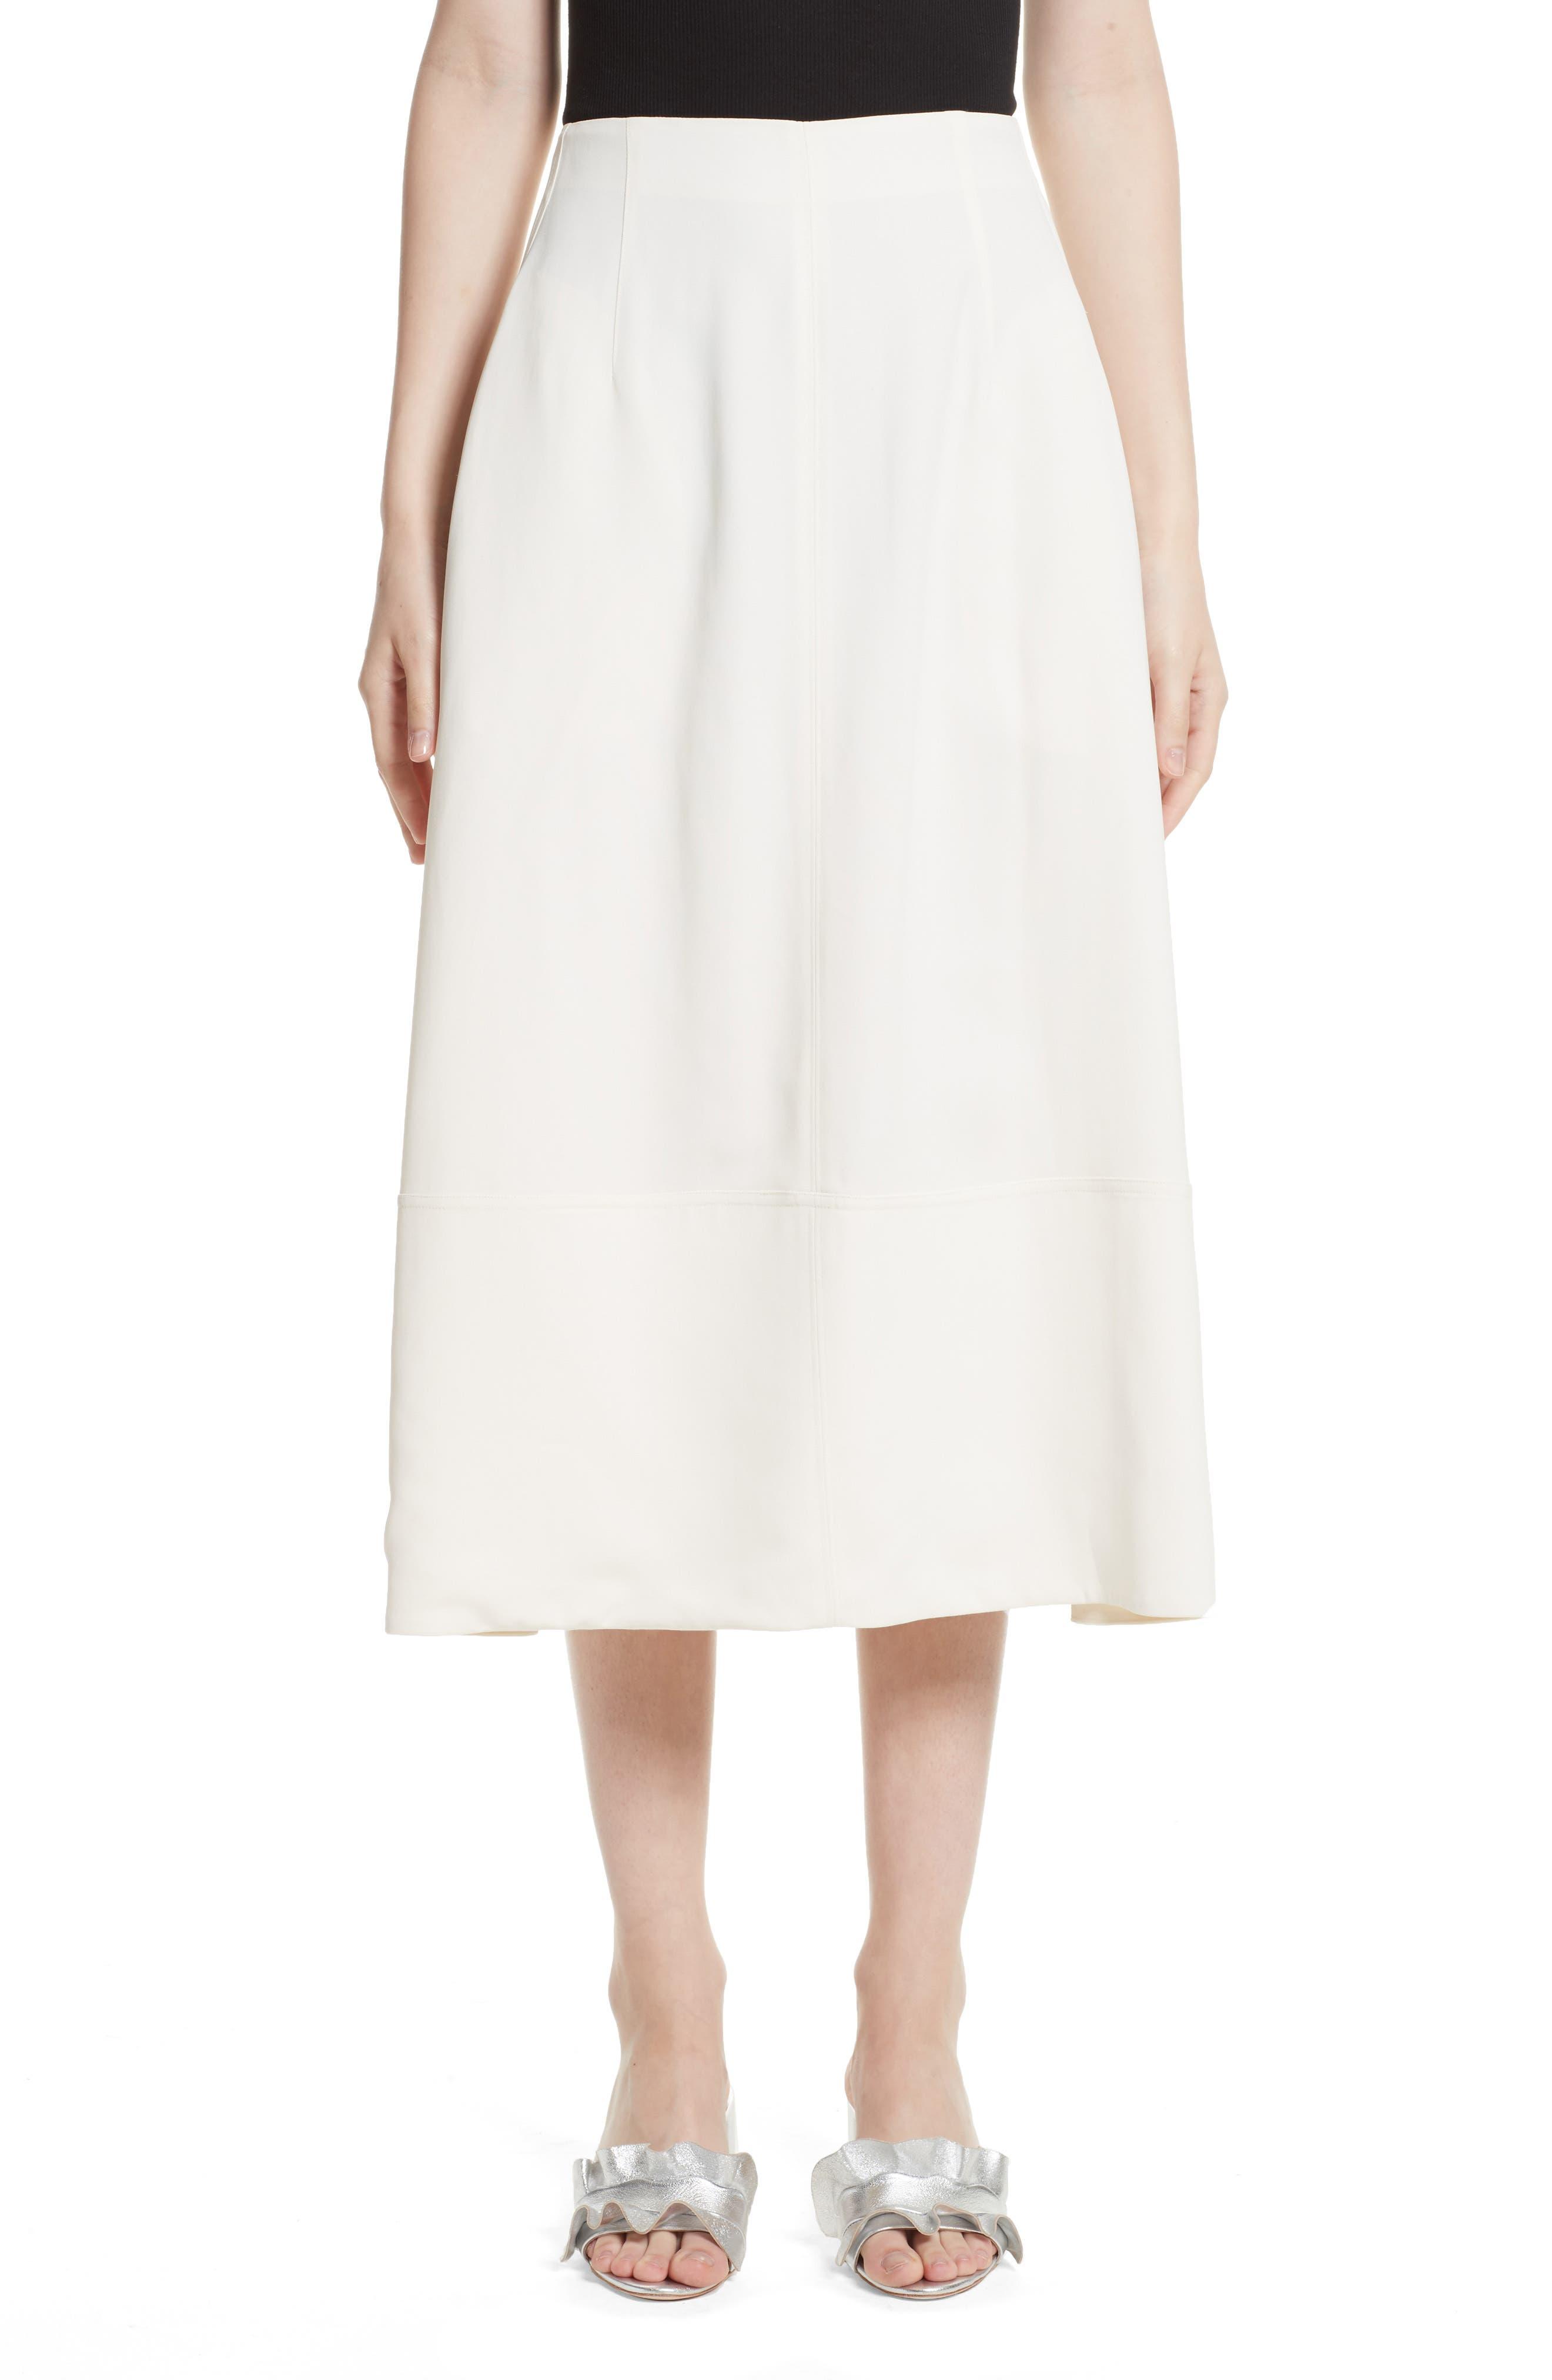 Lottie A-Line Midi Skirt, Main, color, 903